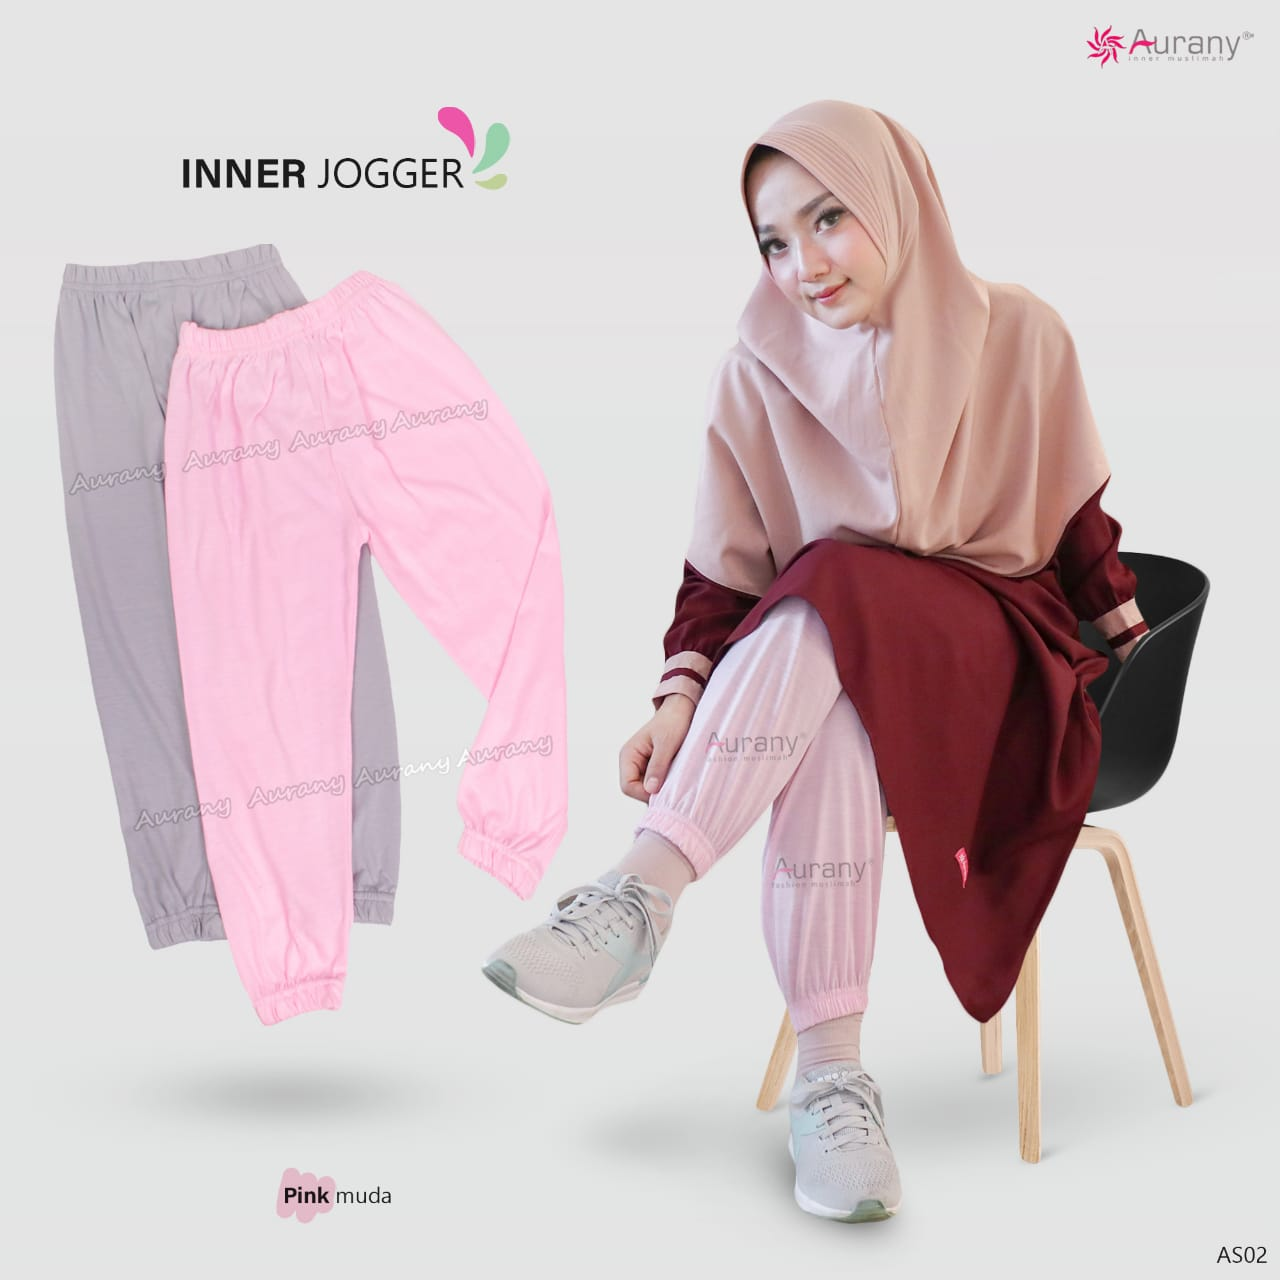 Inner Jogger Kid's by Aurany - Paling Diburu